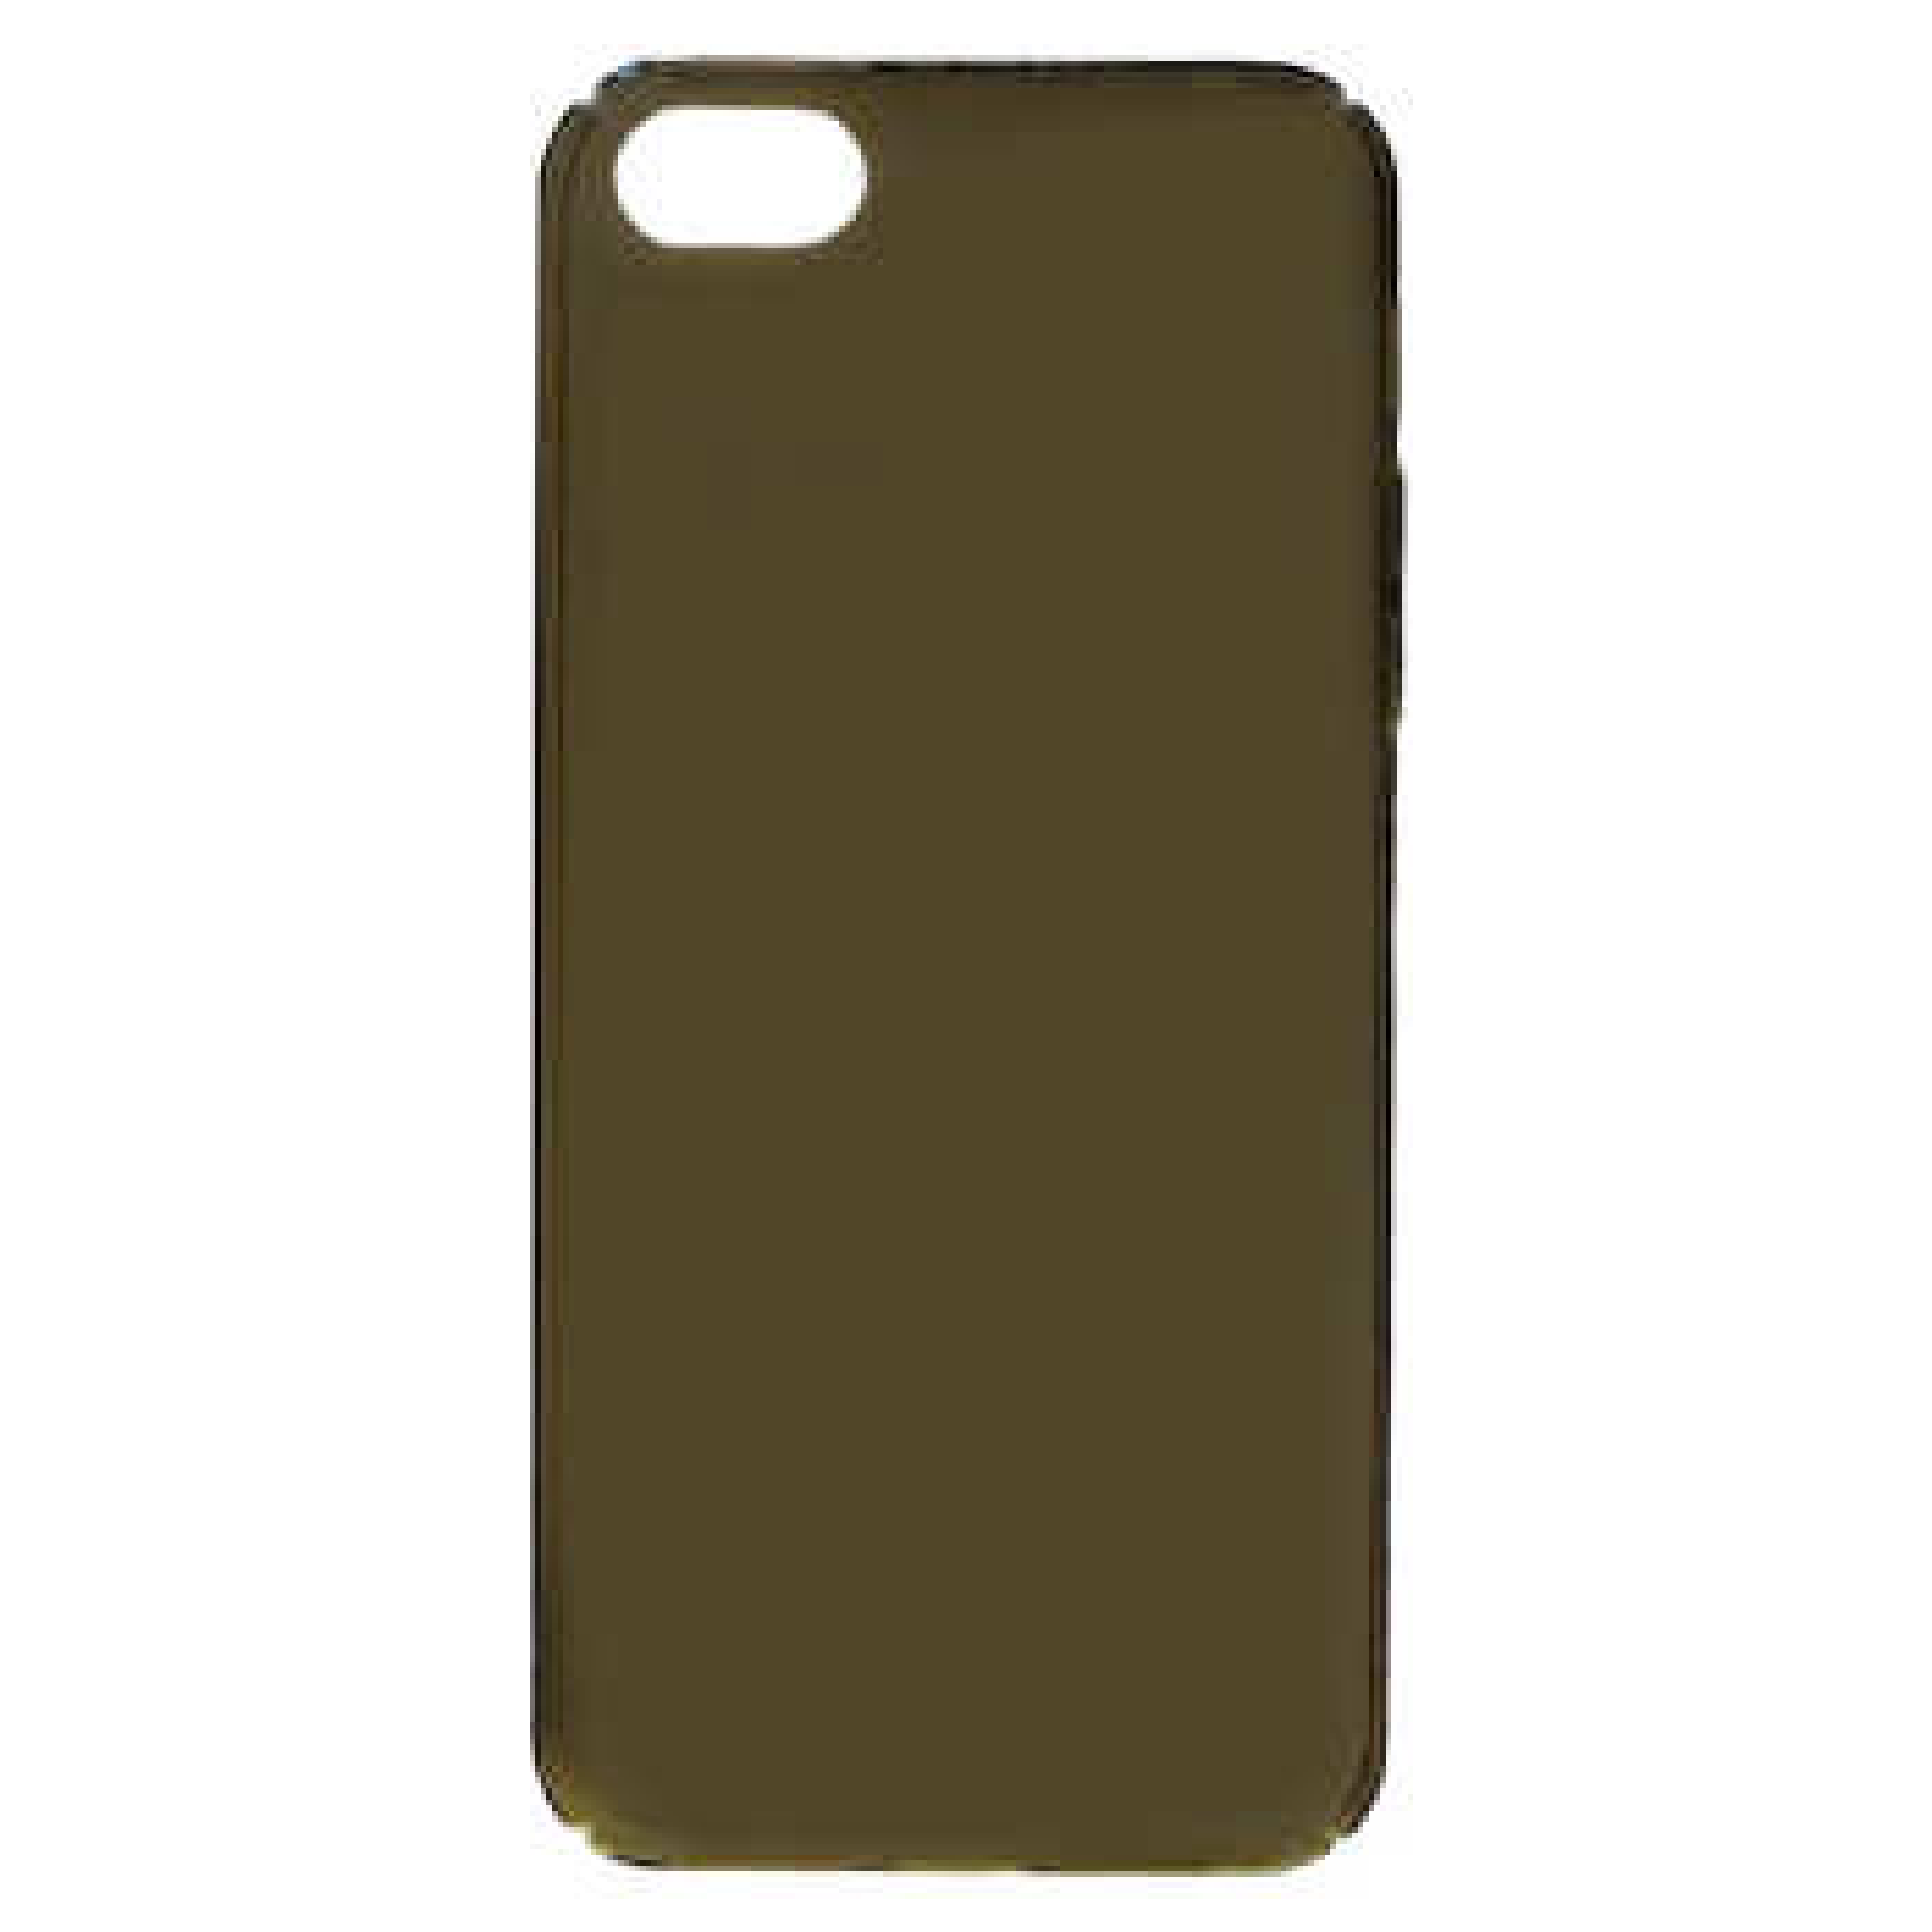 کاور ال جی دی مدل D5 مناسب برای گوشی موبایل اپل iPhone 5/5s/SE